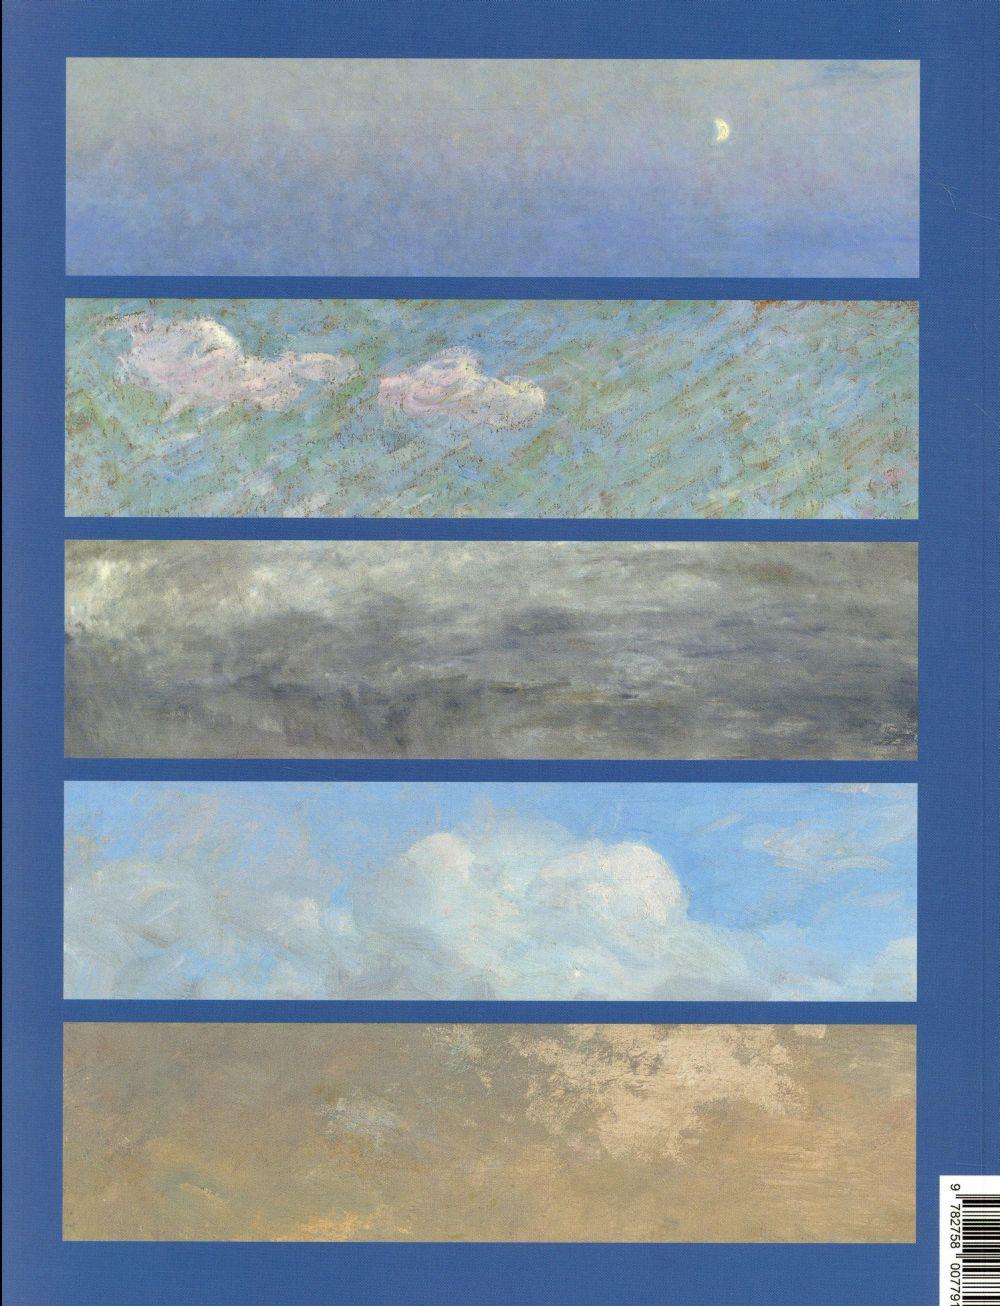 Connaissance des arts ; tresors impressionnistes collection ordrupgaard